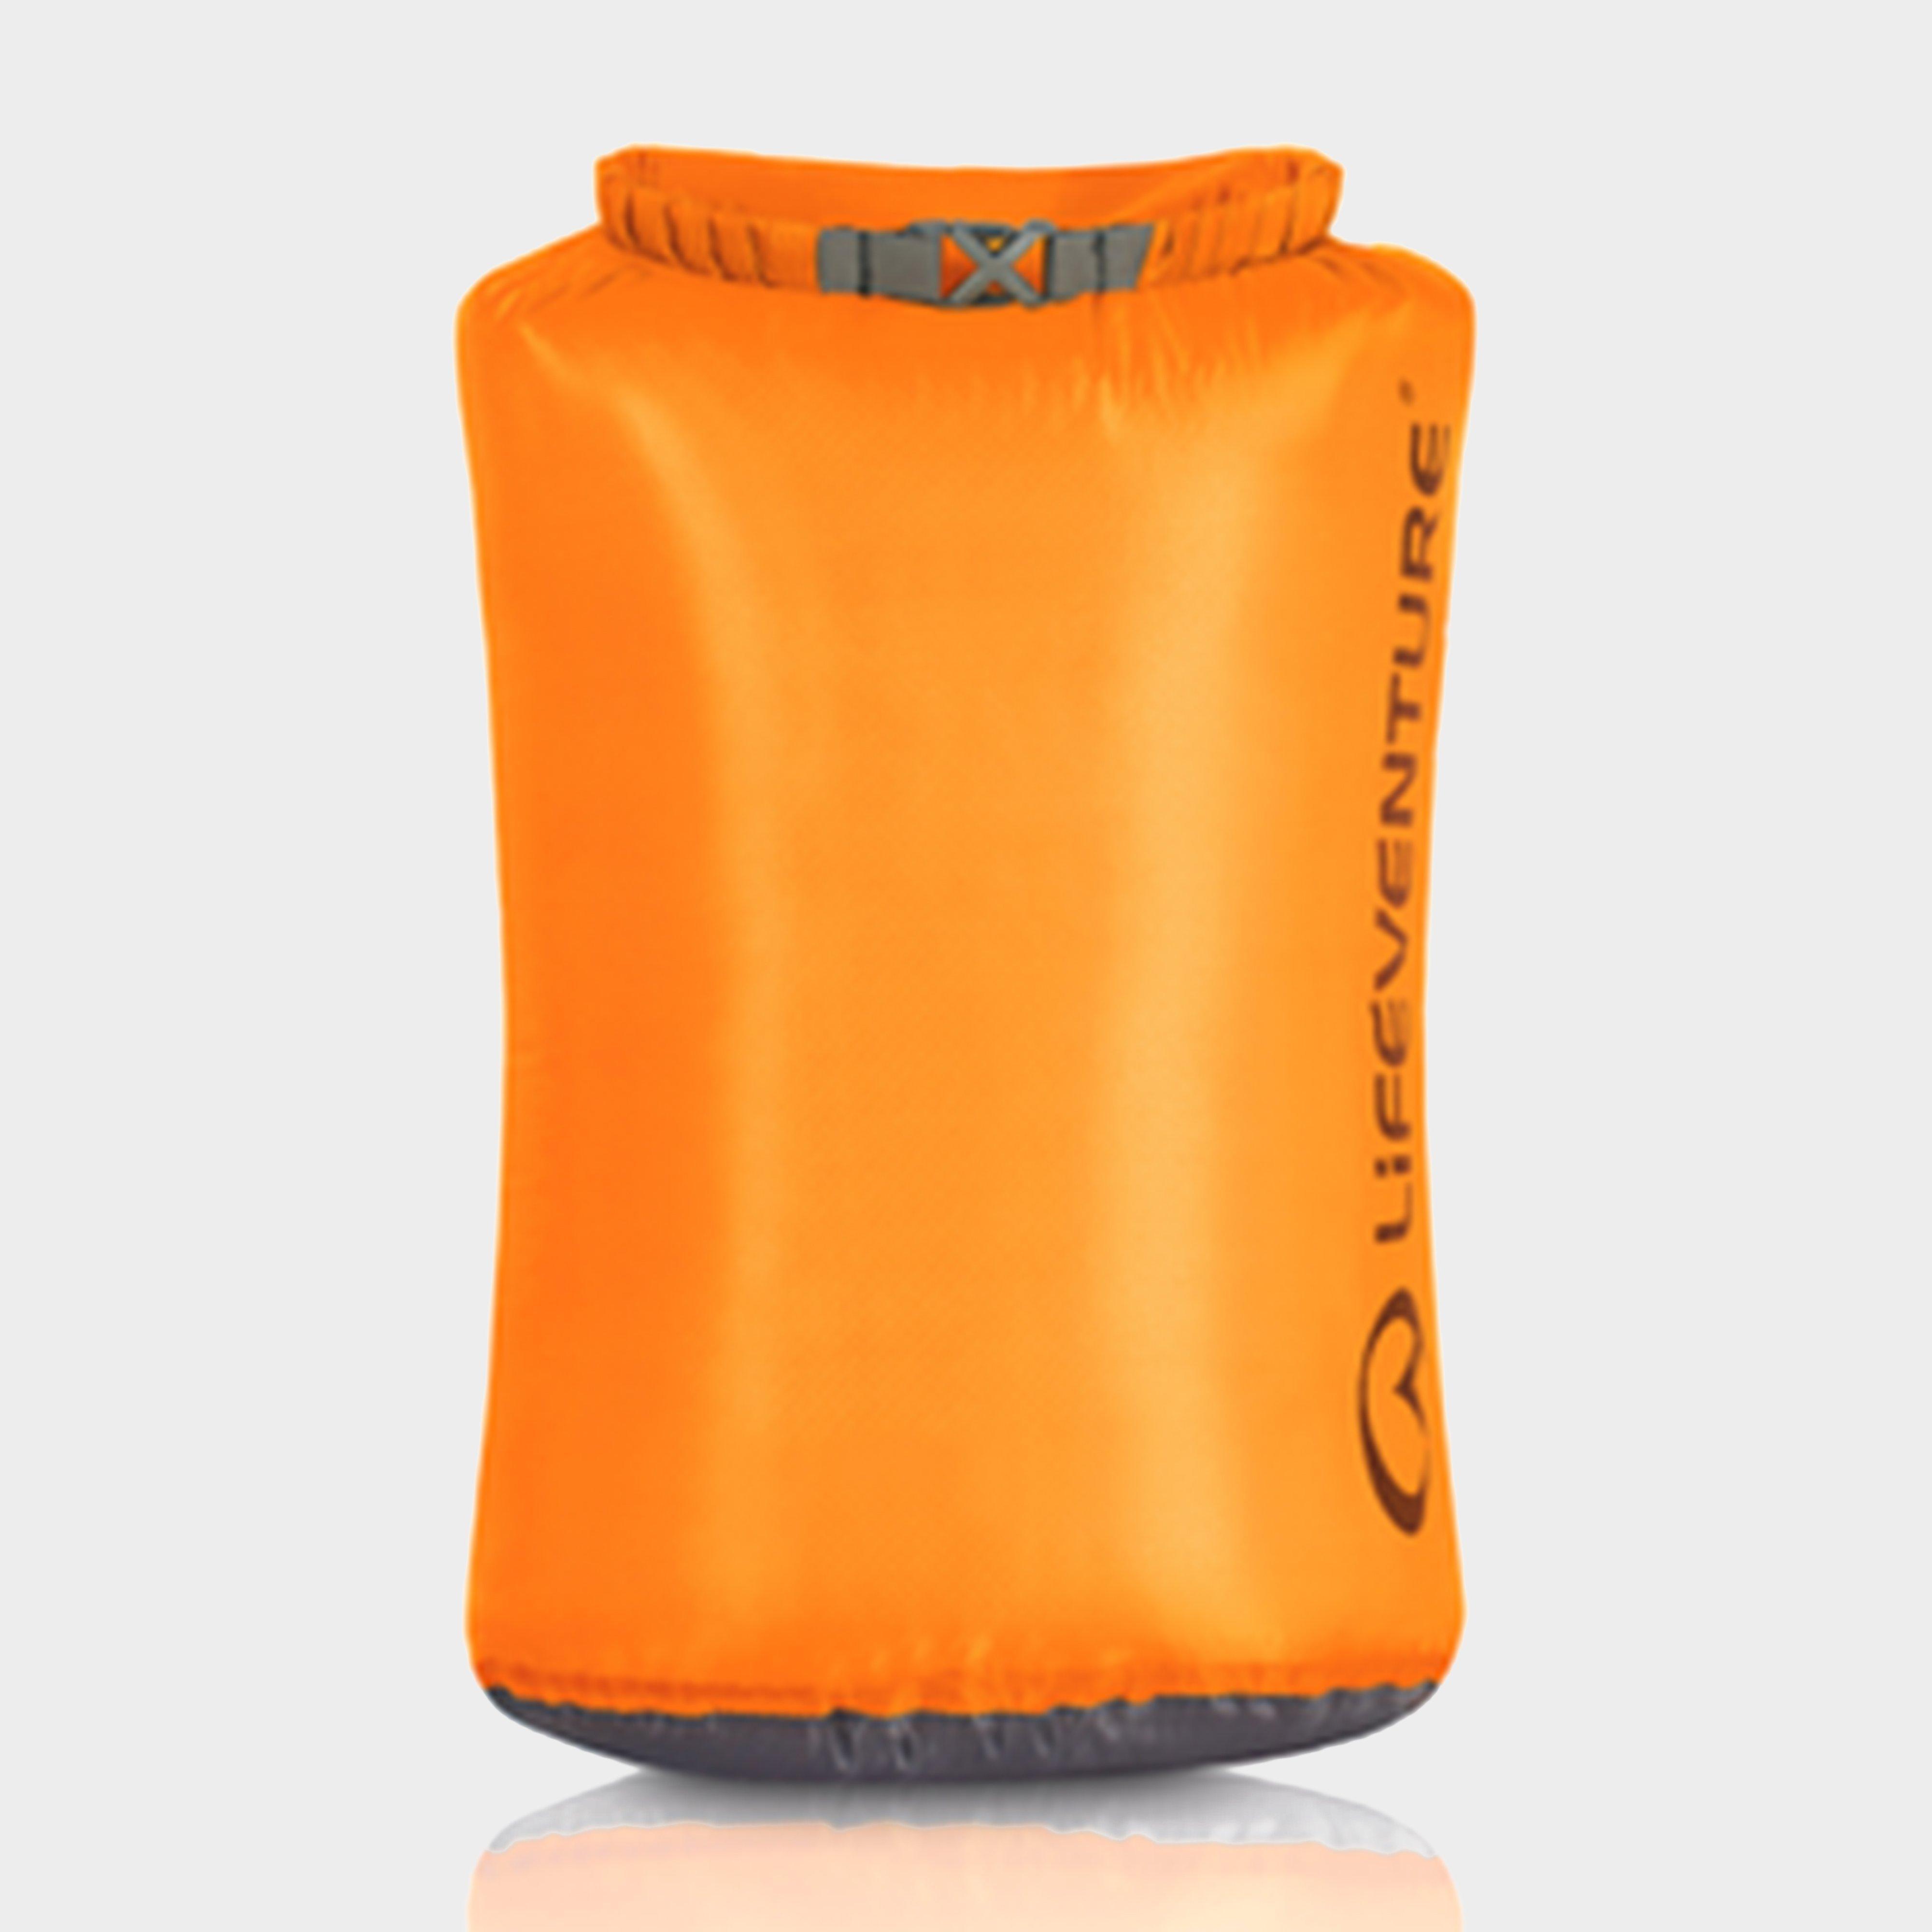 Lifeventure Lifeventure Ultralight 15L Dry Bag - N/A, N/A